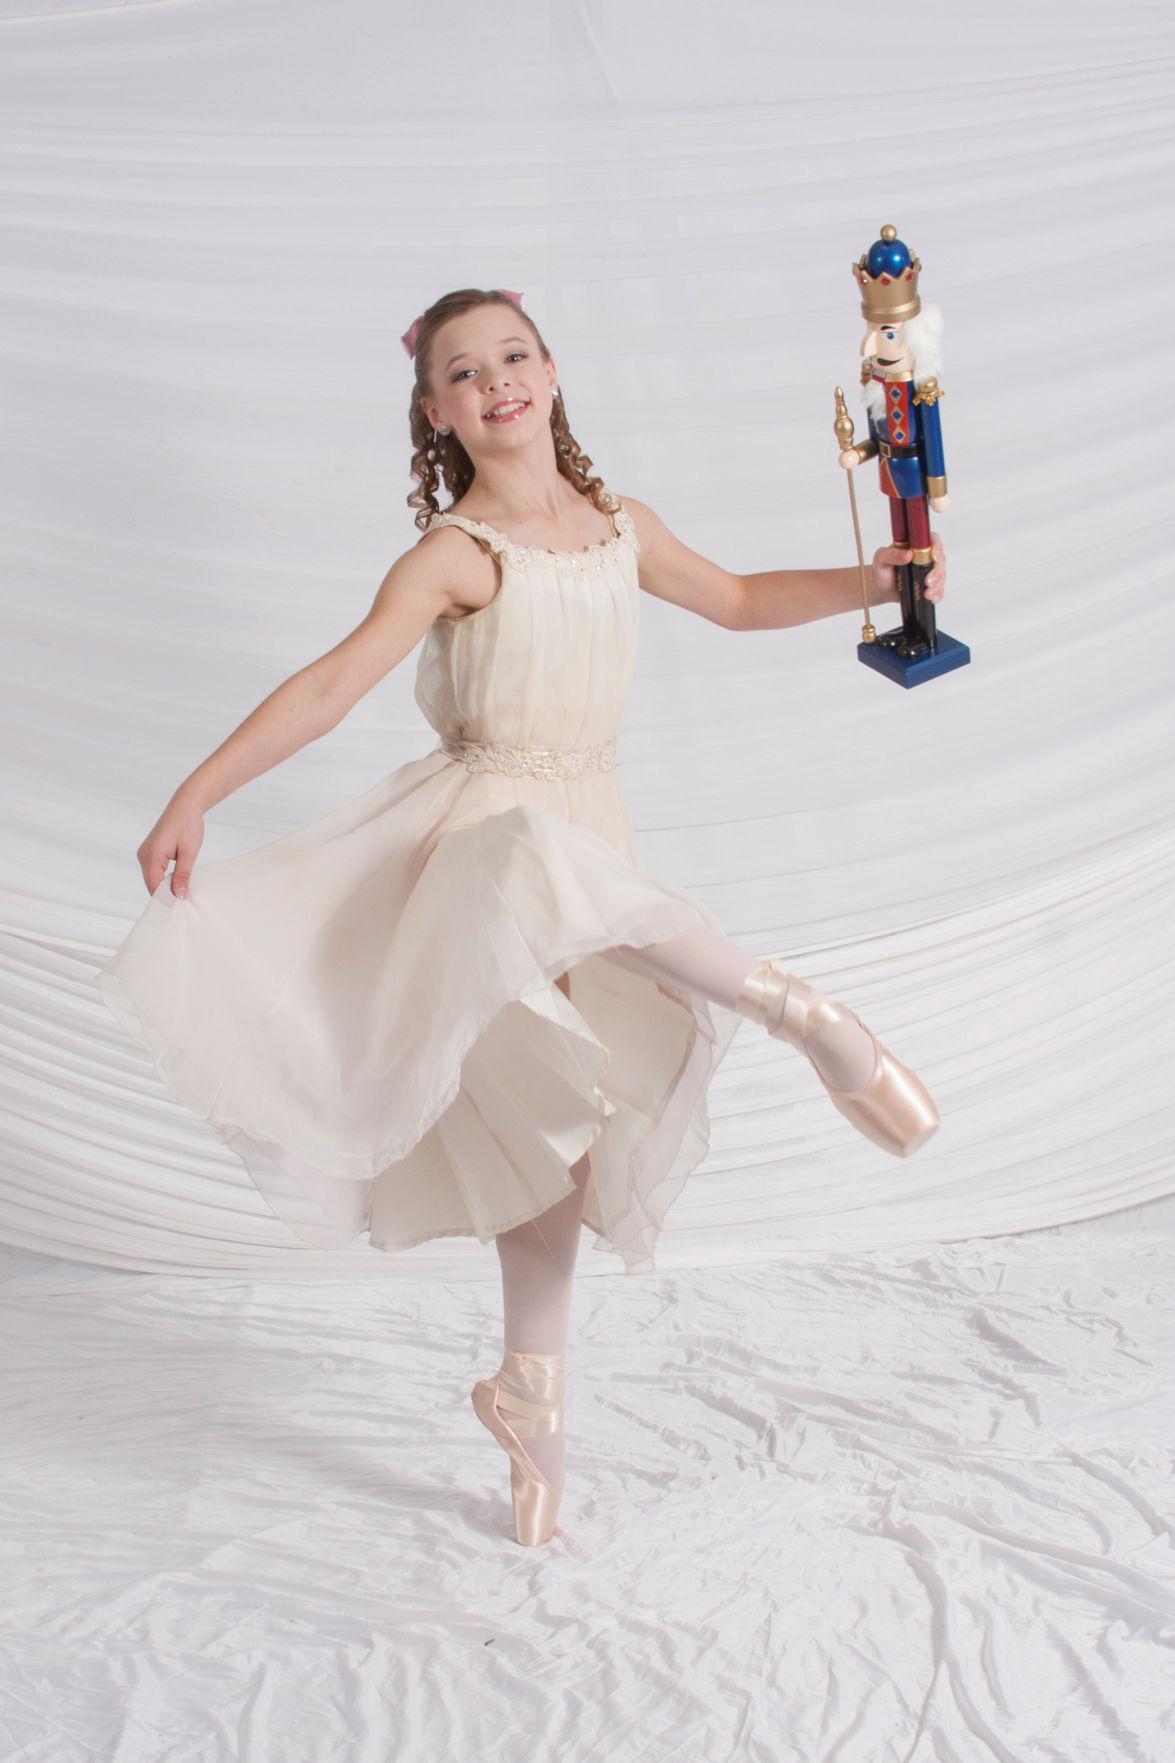 Livingston Parish dancers will perform in Hammond's 'Nutcracker'